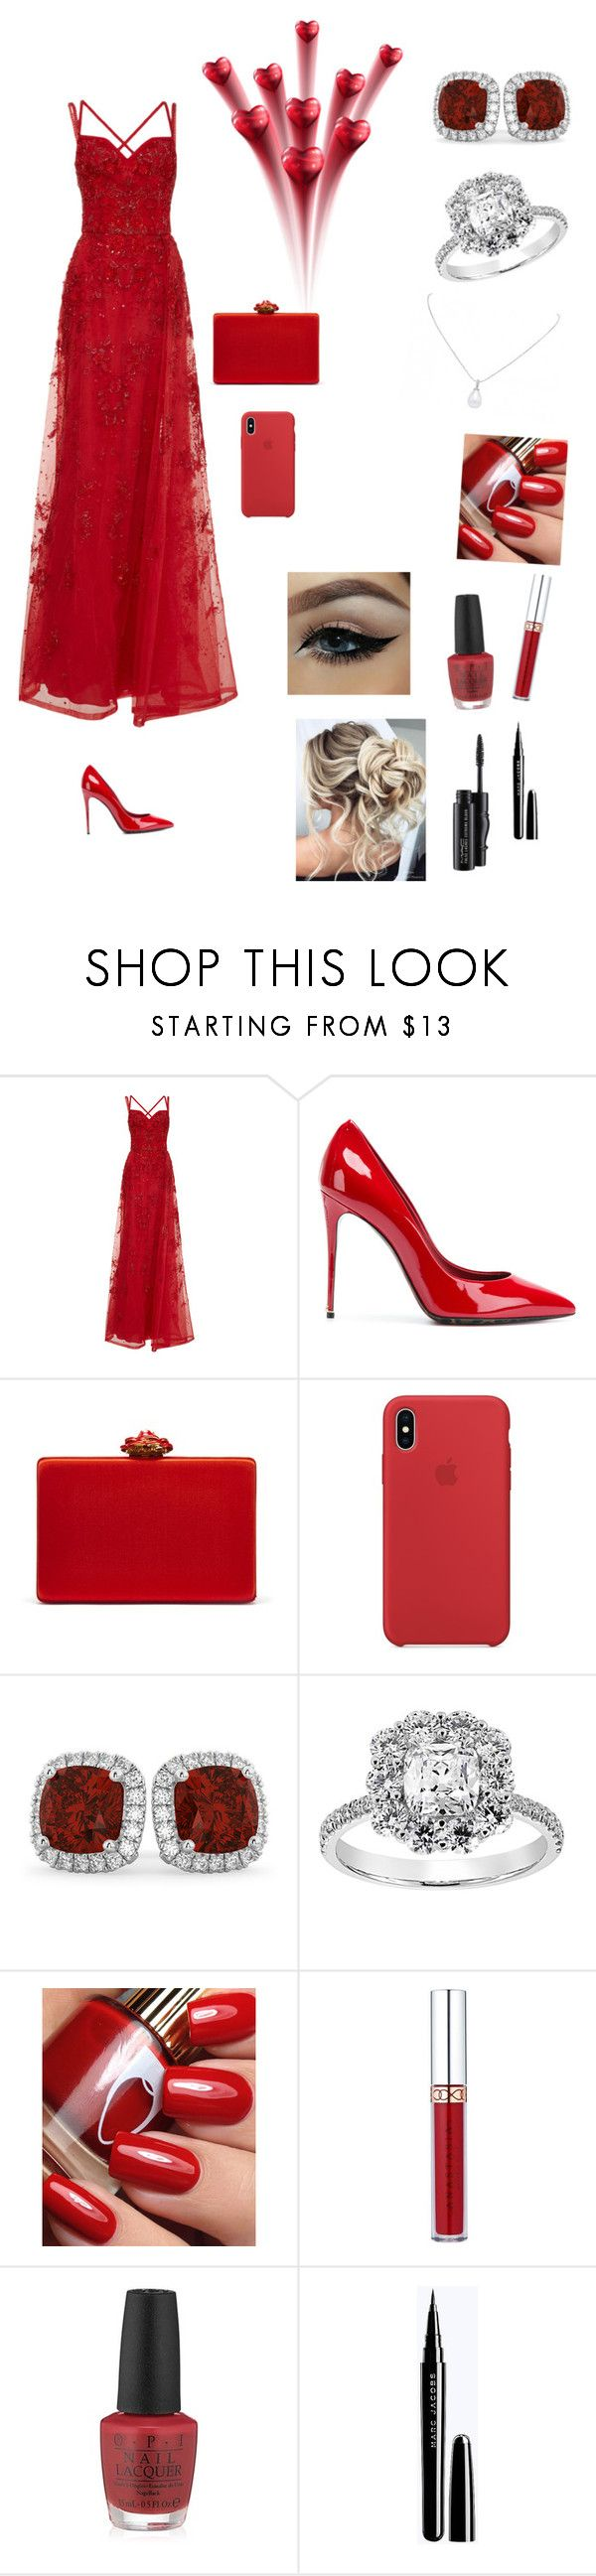 """Untitled #965"" by kaitlinlintz ❤ liked on Polyvore featuring Elie Saab, Dolce&Gabbana, Oscar de la Renta, Allurez, Anastasia Beverly Hills, OPI and MAC Cosmetics"